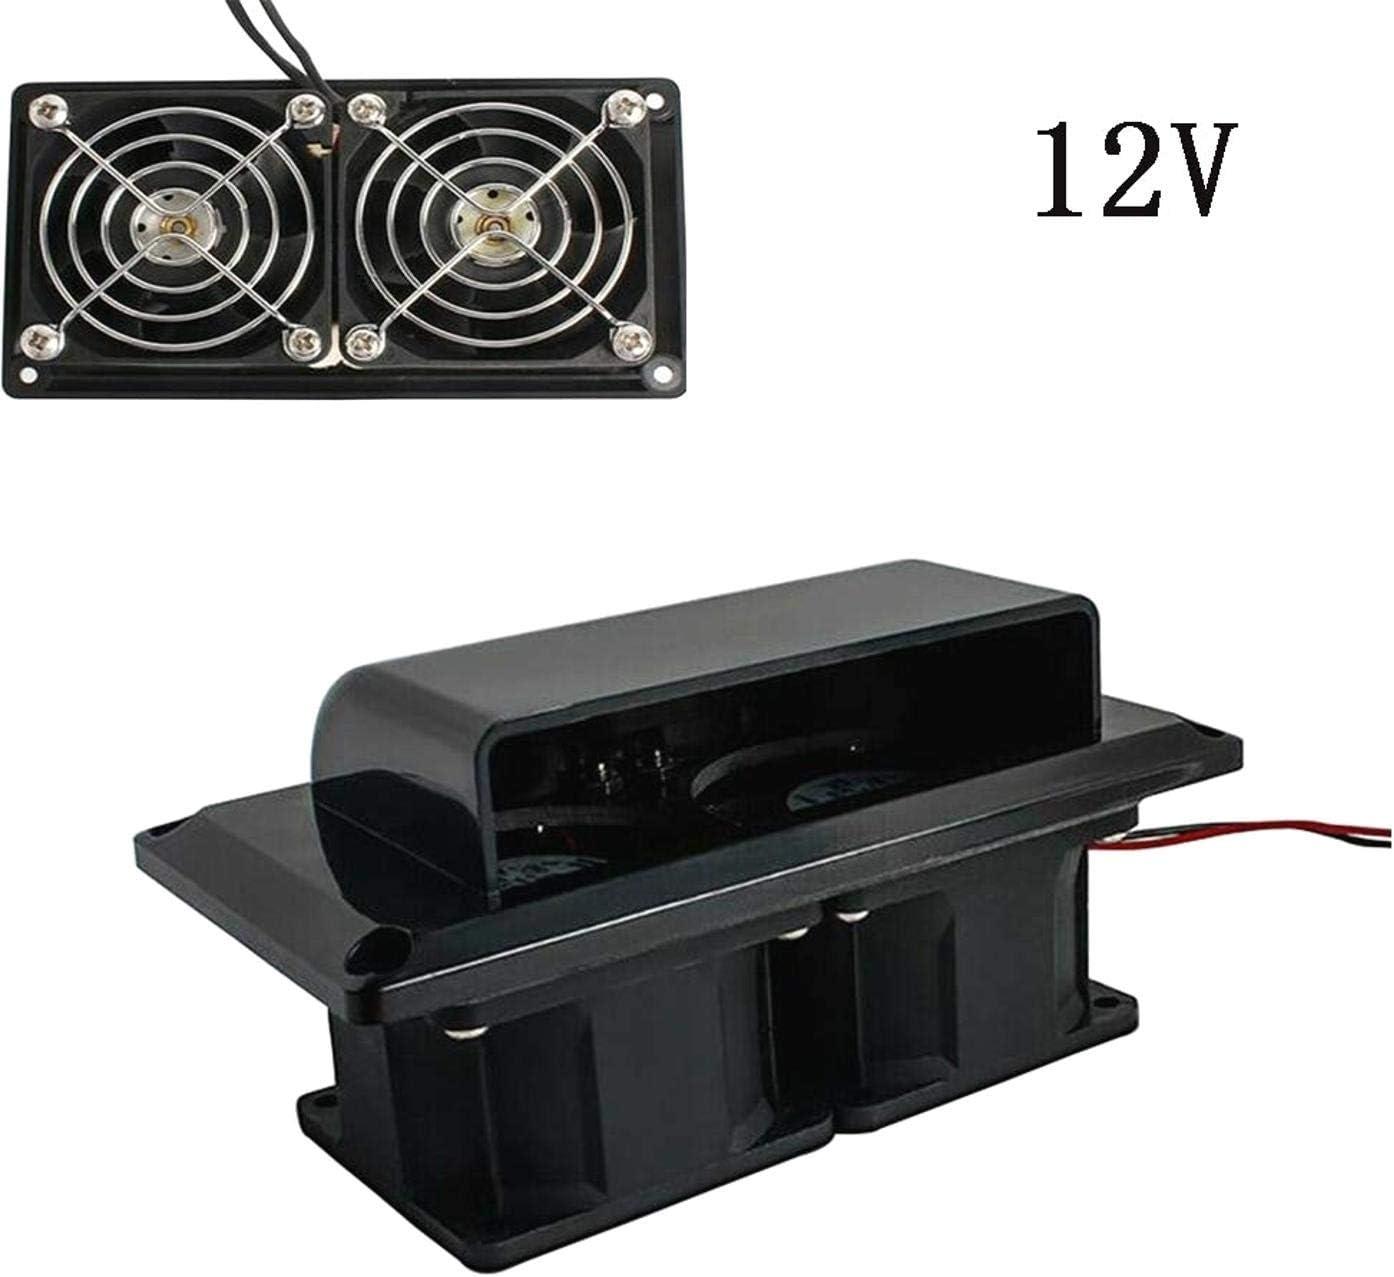 DULALA Ventilaci/ón de ventilaci/ón de Aire Lateral Ventilador de Aire de 25 W para Remolque de Caravana de Autocaravana RV